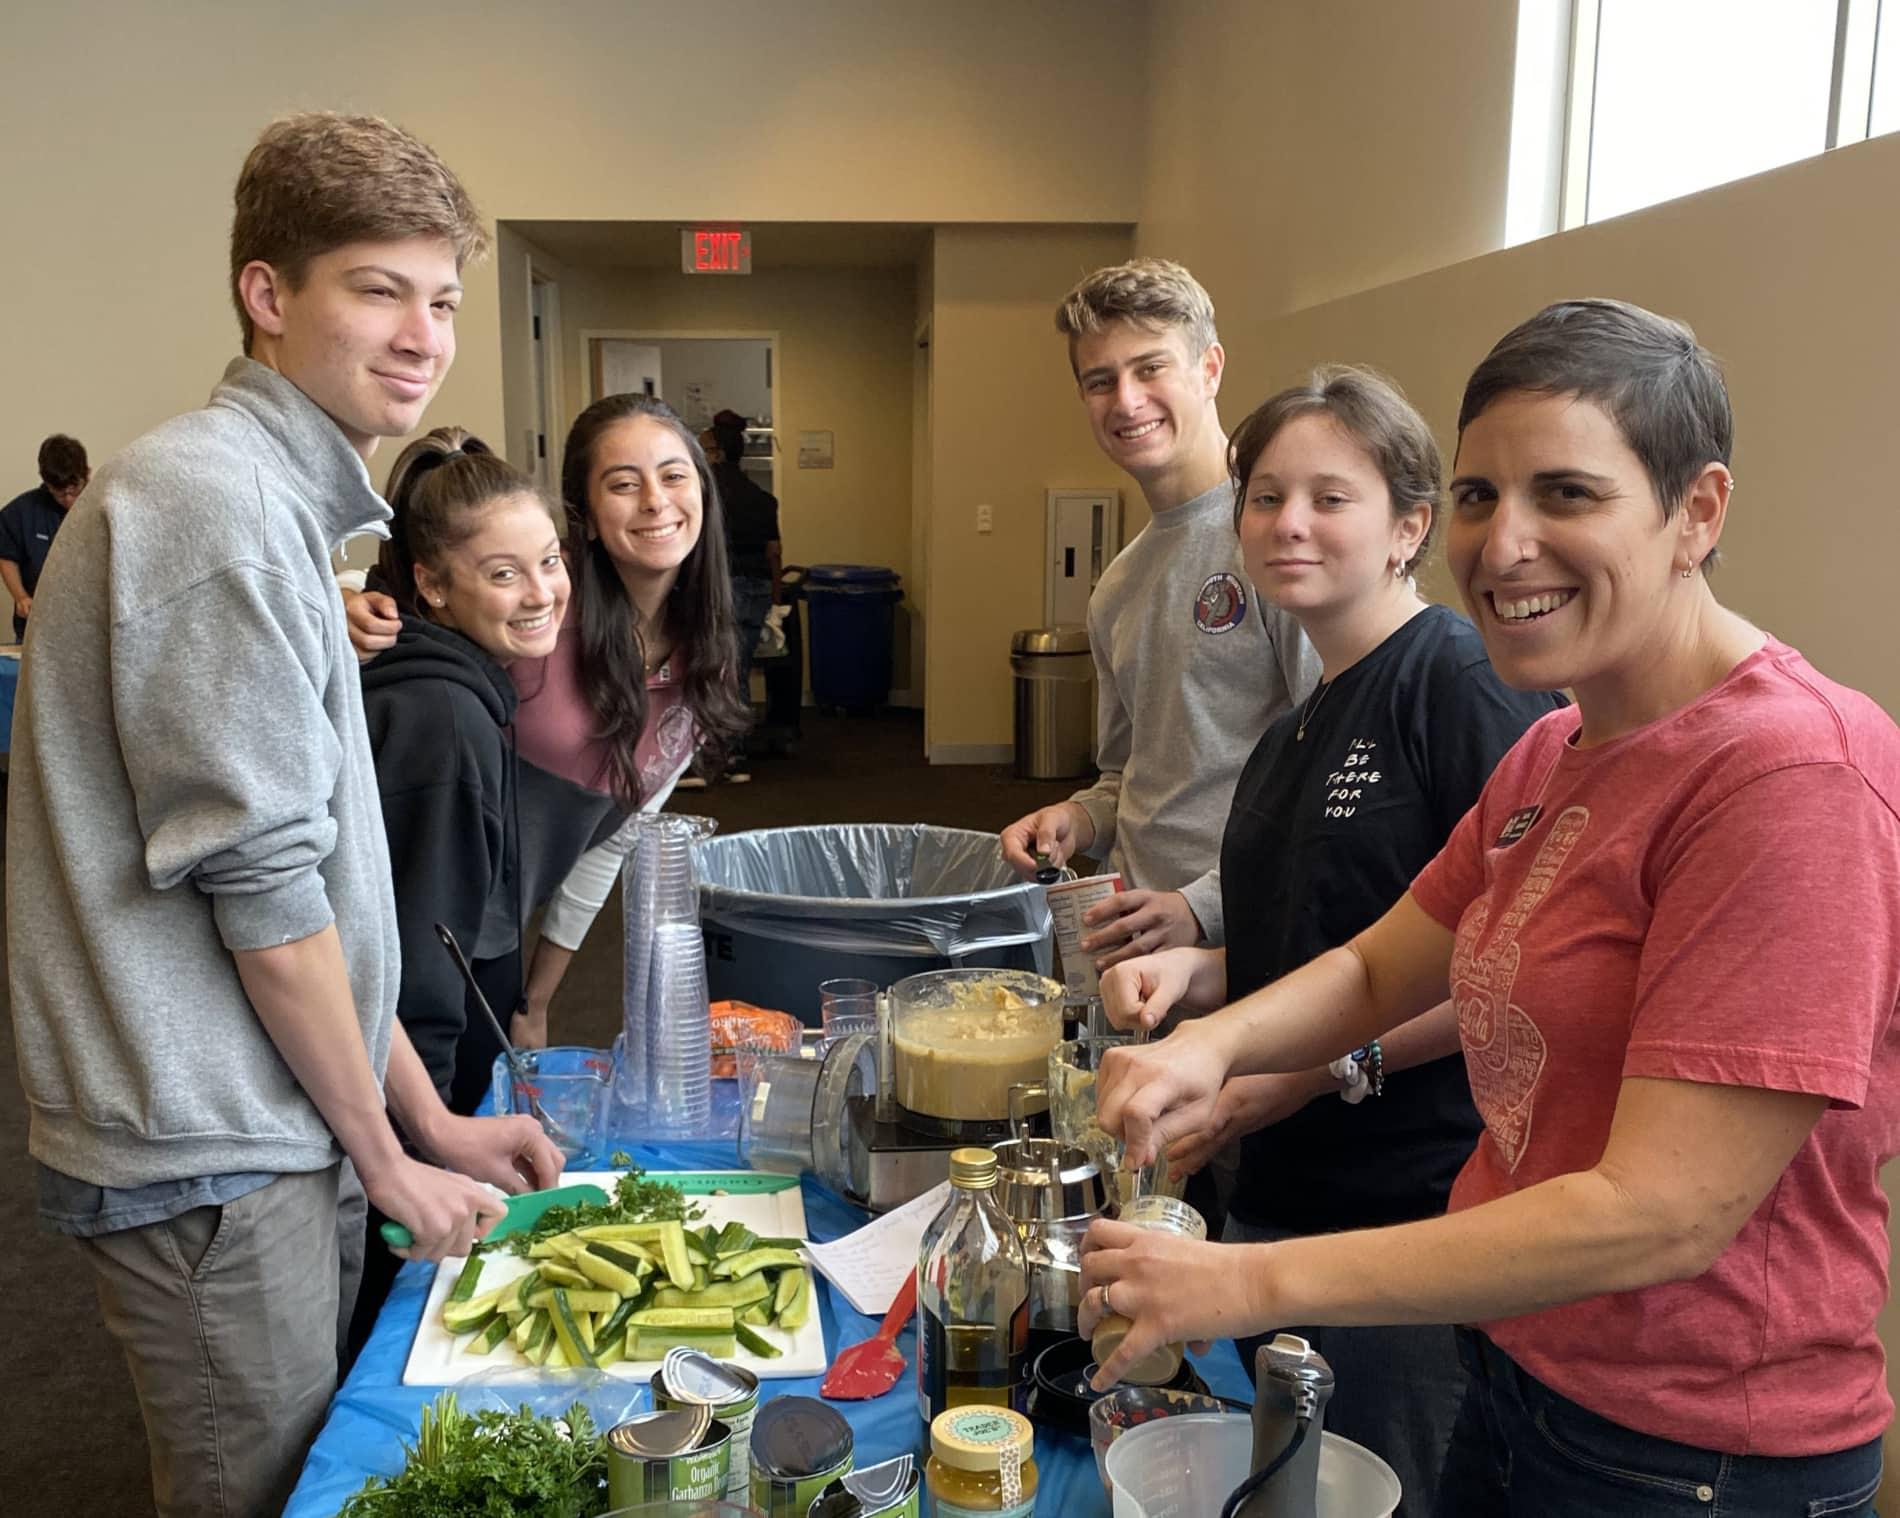 Teens Cooking